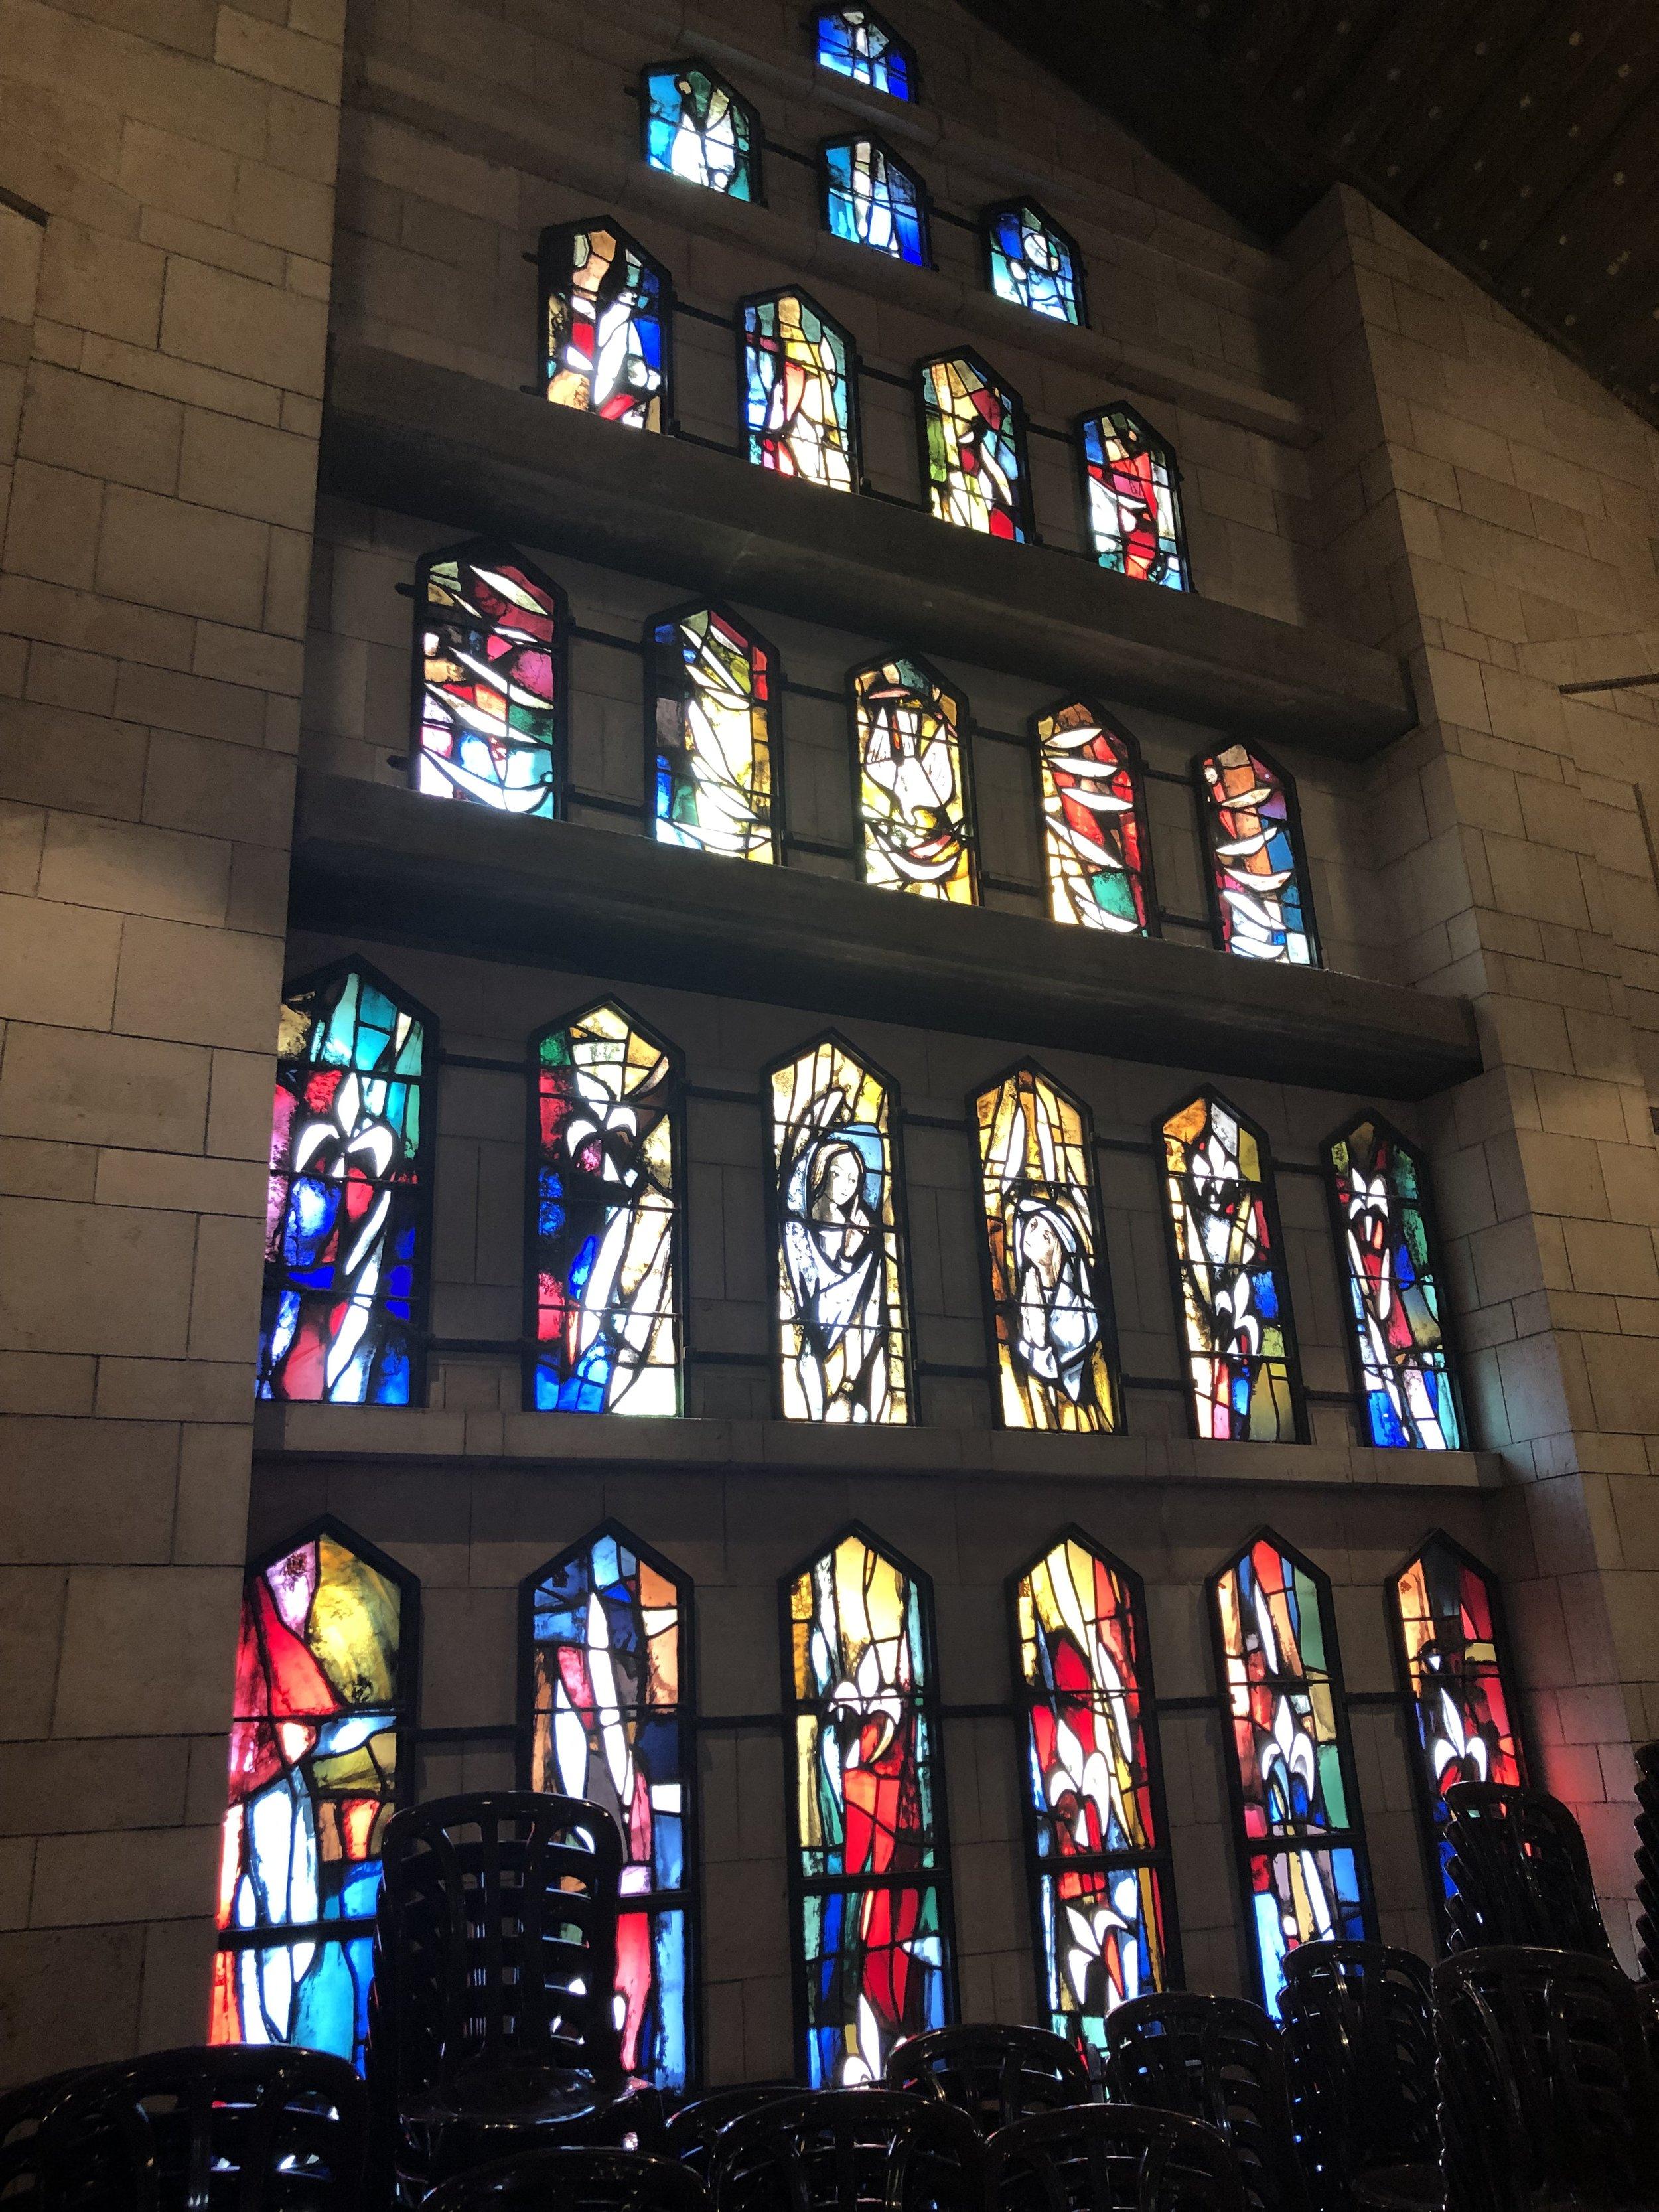 IT - Church of the Annunciation 3.jpg